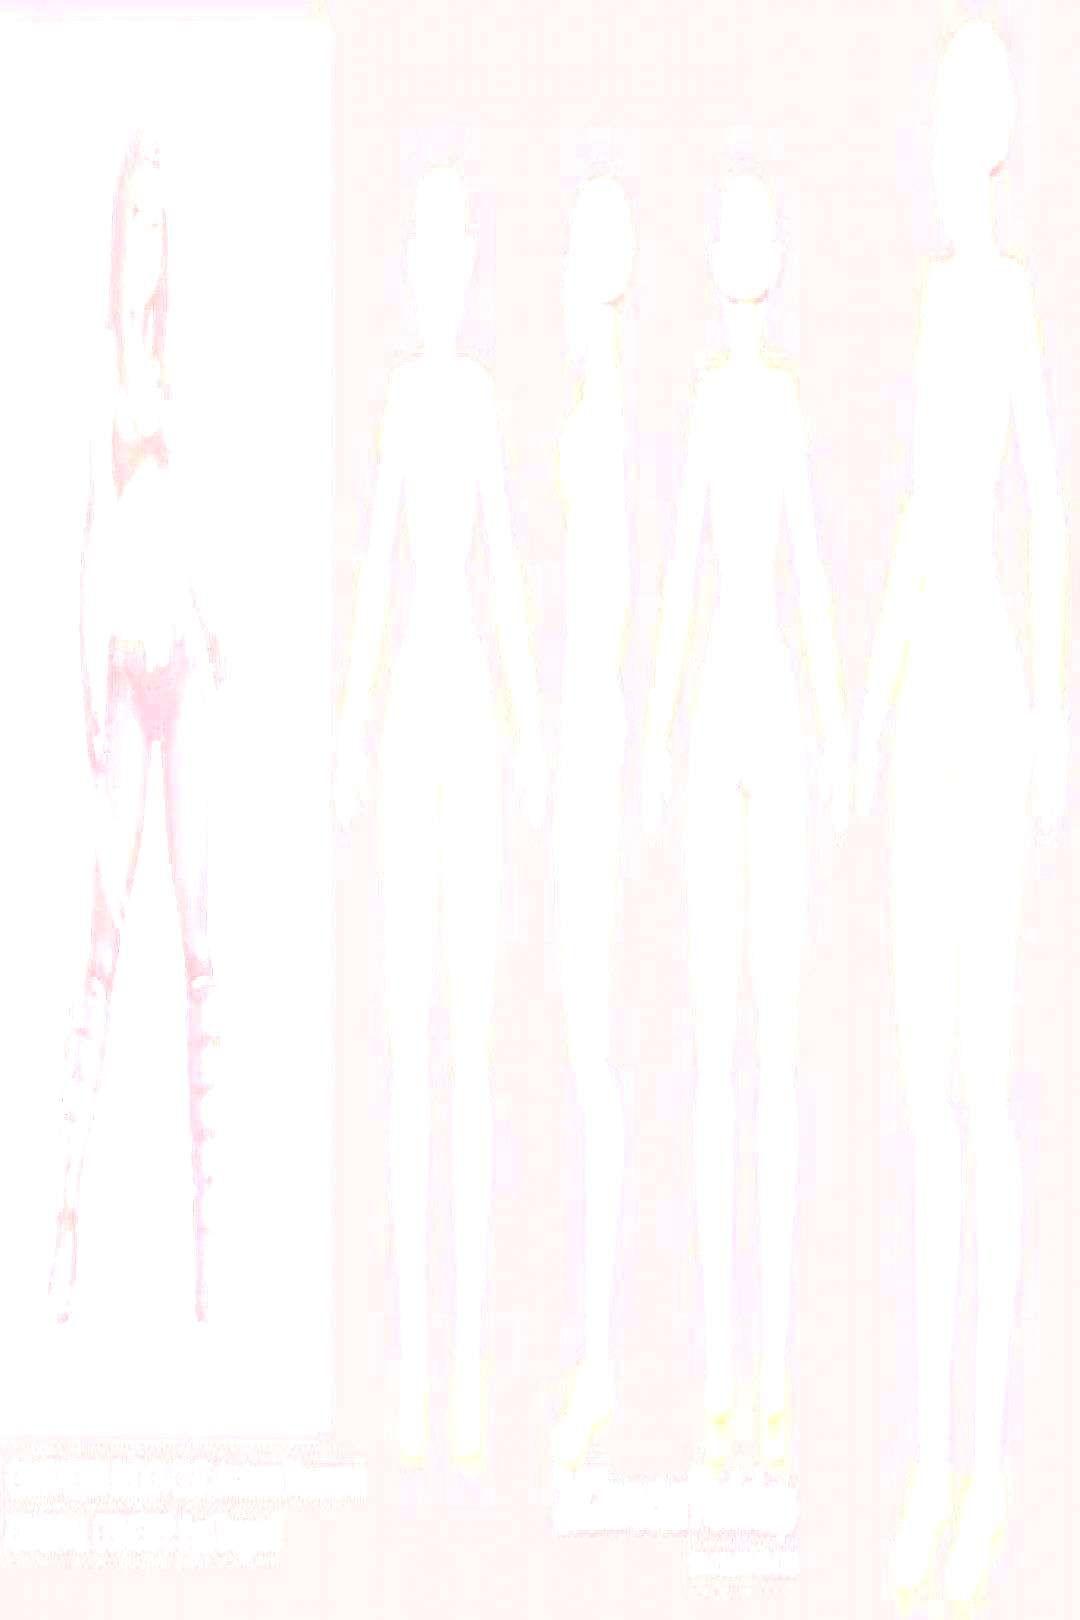 #burstenkorper #websitezbrush #brstenkrper #brstenyou #zbrush #cuerpo #brsten #andyou #corps #byou #find #more #body #and #o...